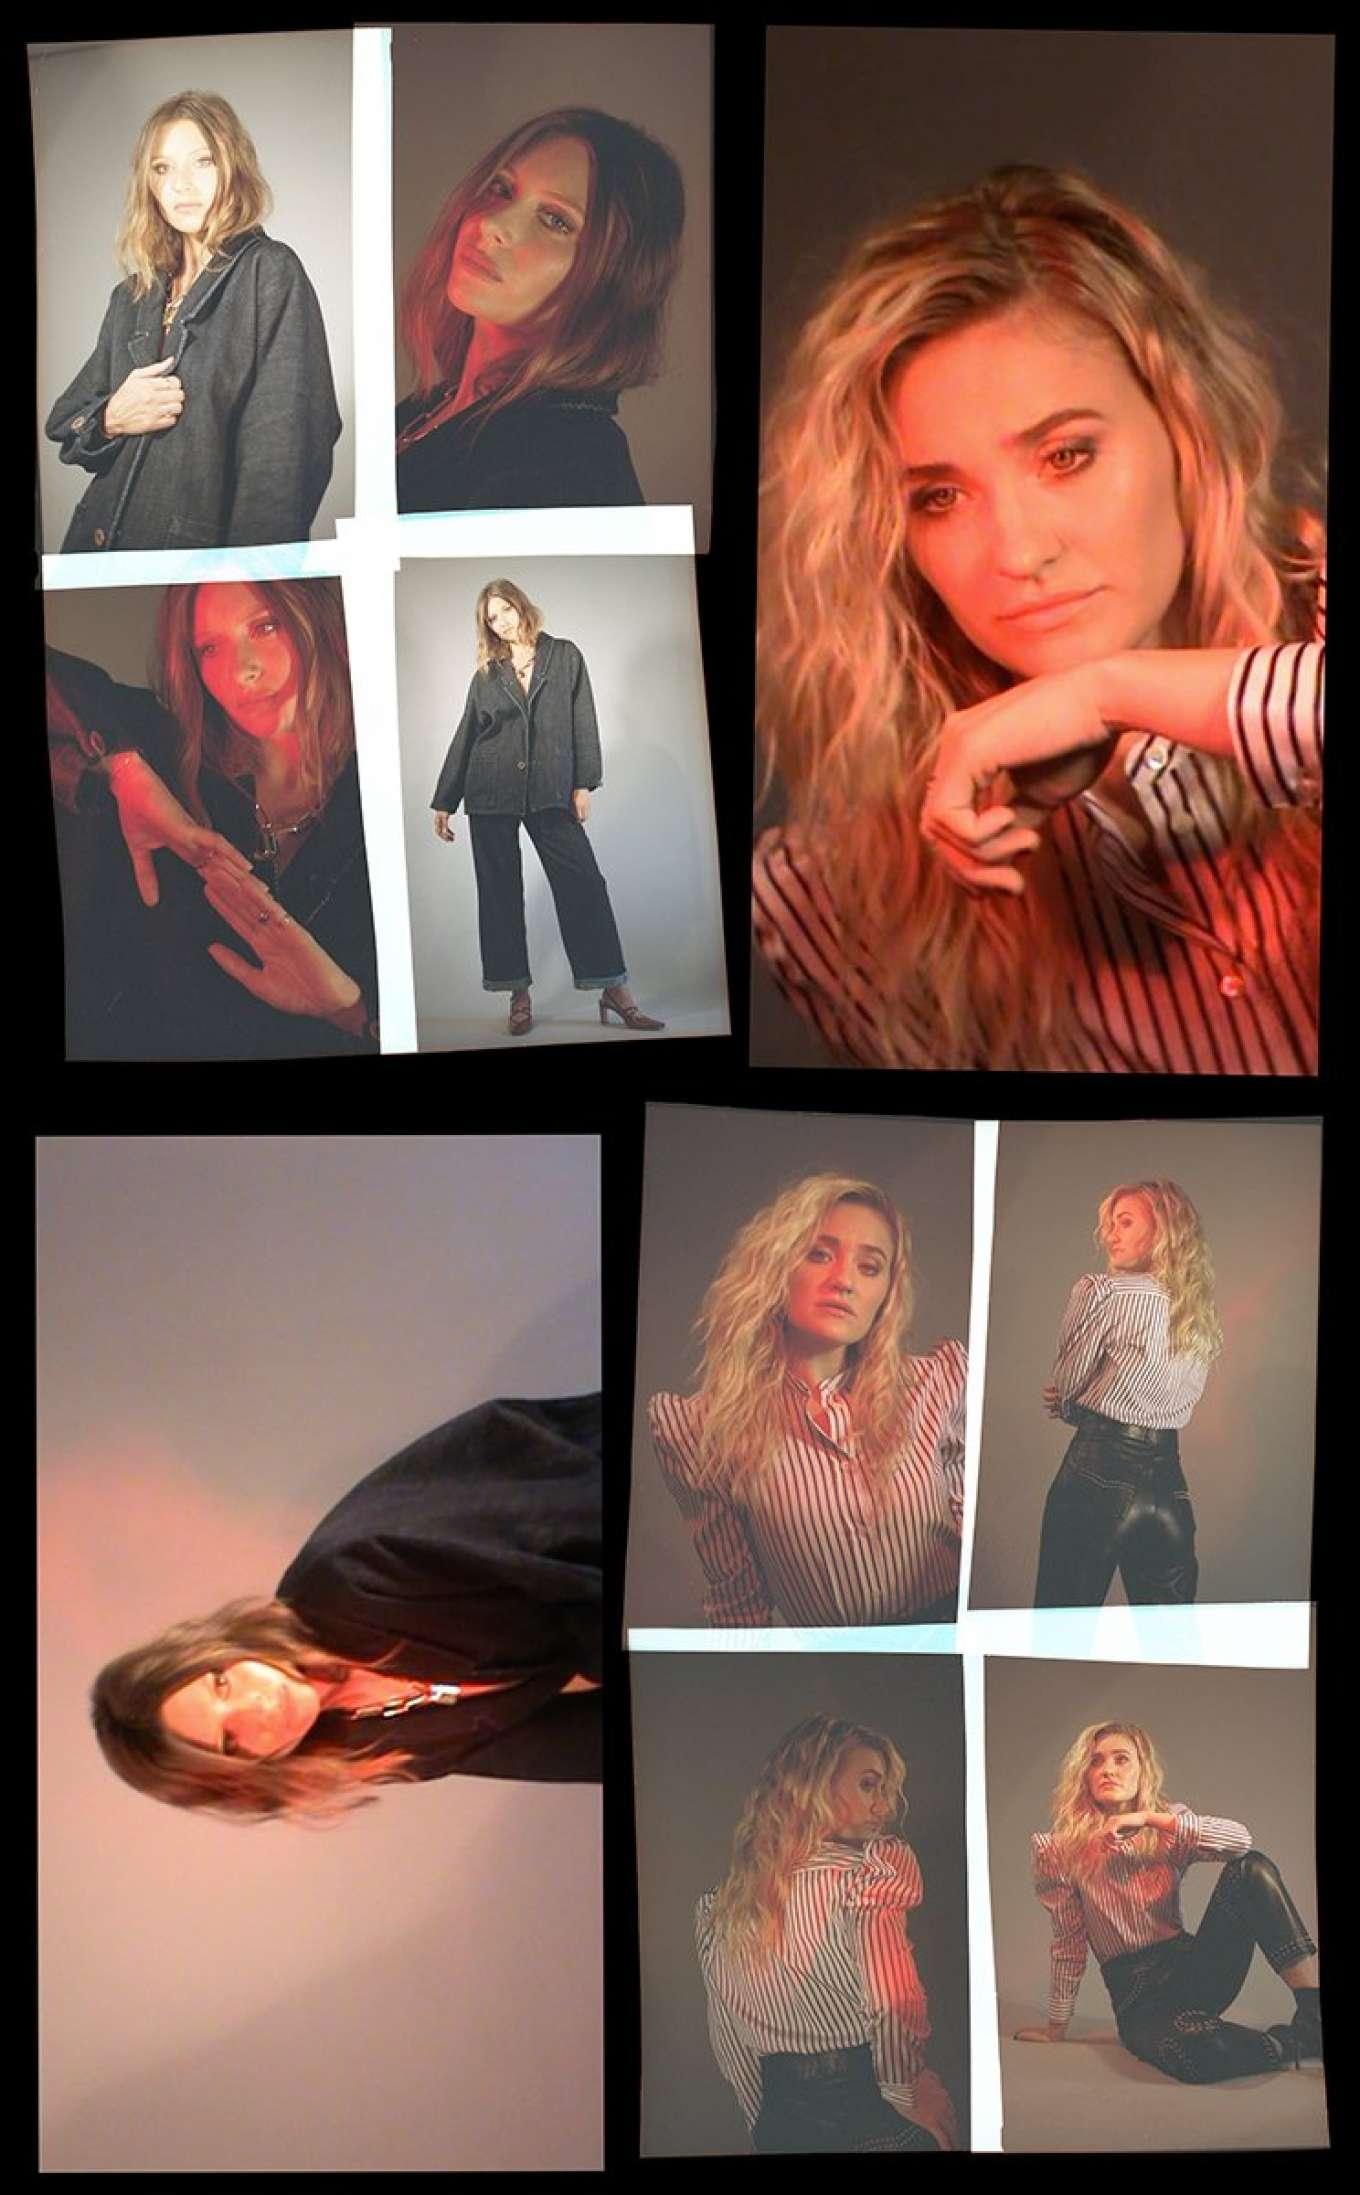 AJ Michalka 2019 : AJ and Aly Michalka – Notion Magazine 2019-10